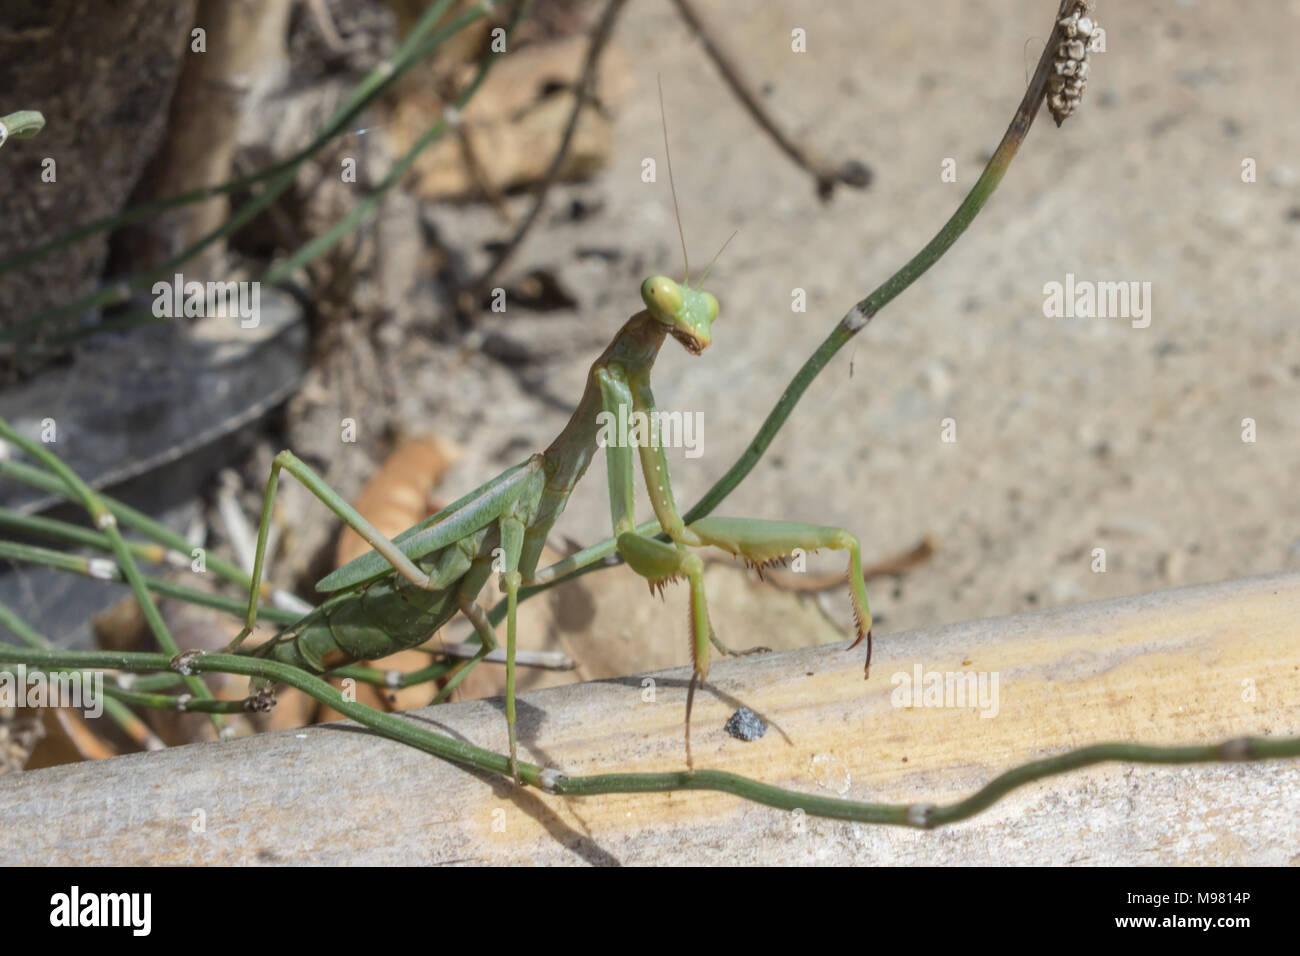 Gottesanbeterin, Europäische Gottesanbeterin, Mantis Religiosa, Mantis, Preying Mantis, Foto September 2017 in Almeria Andalusien Spanien Stockbild